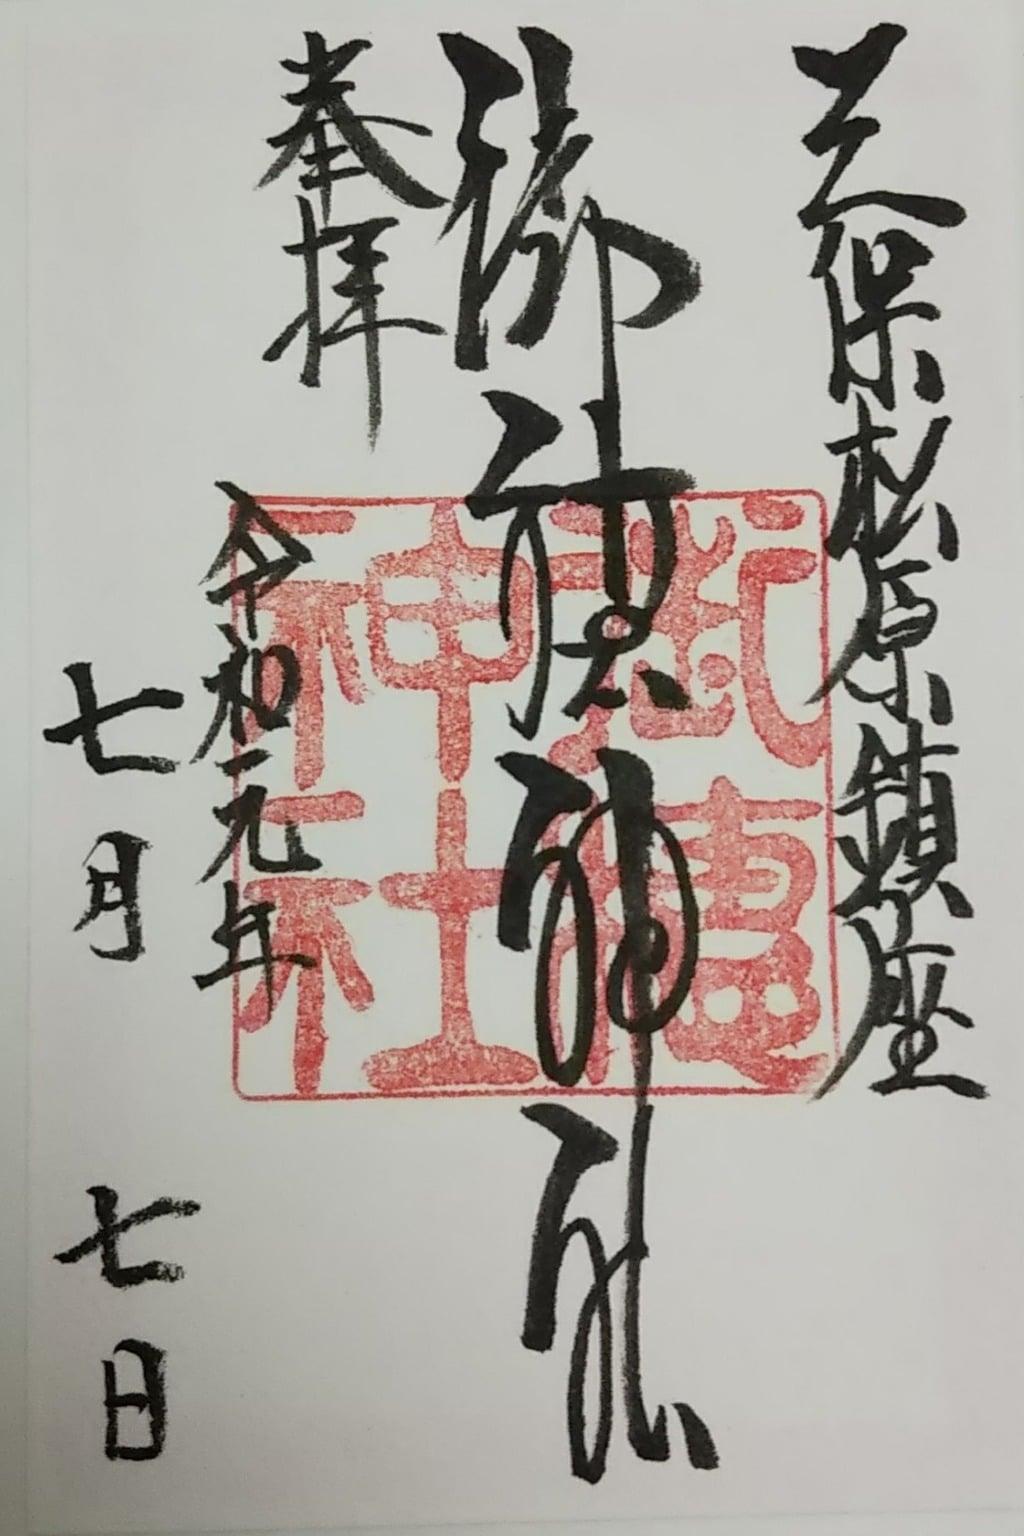 御穂神社の御朱印